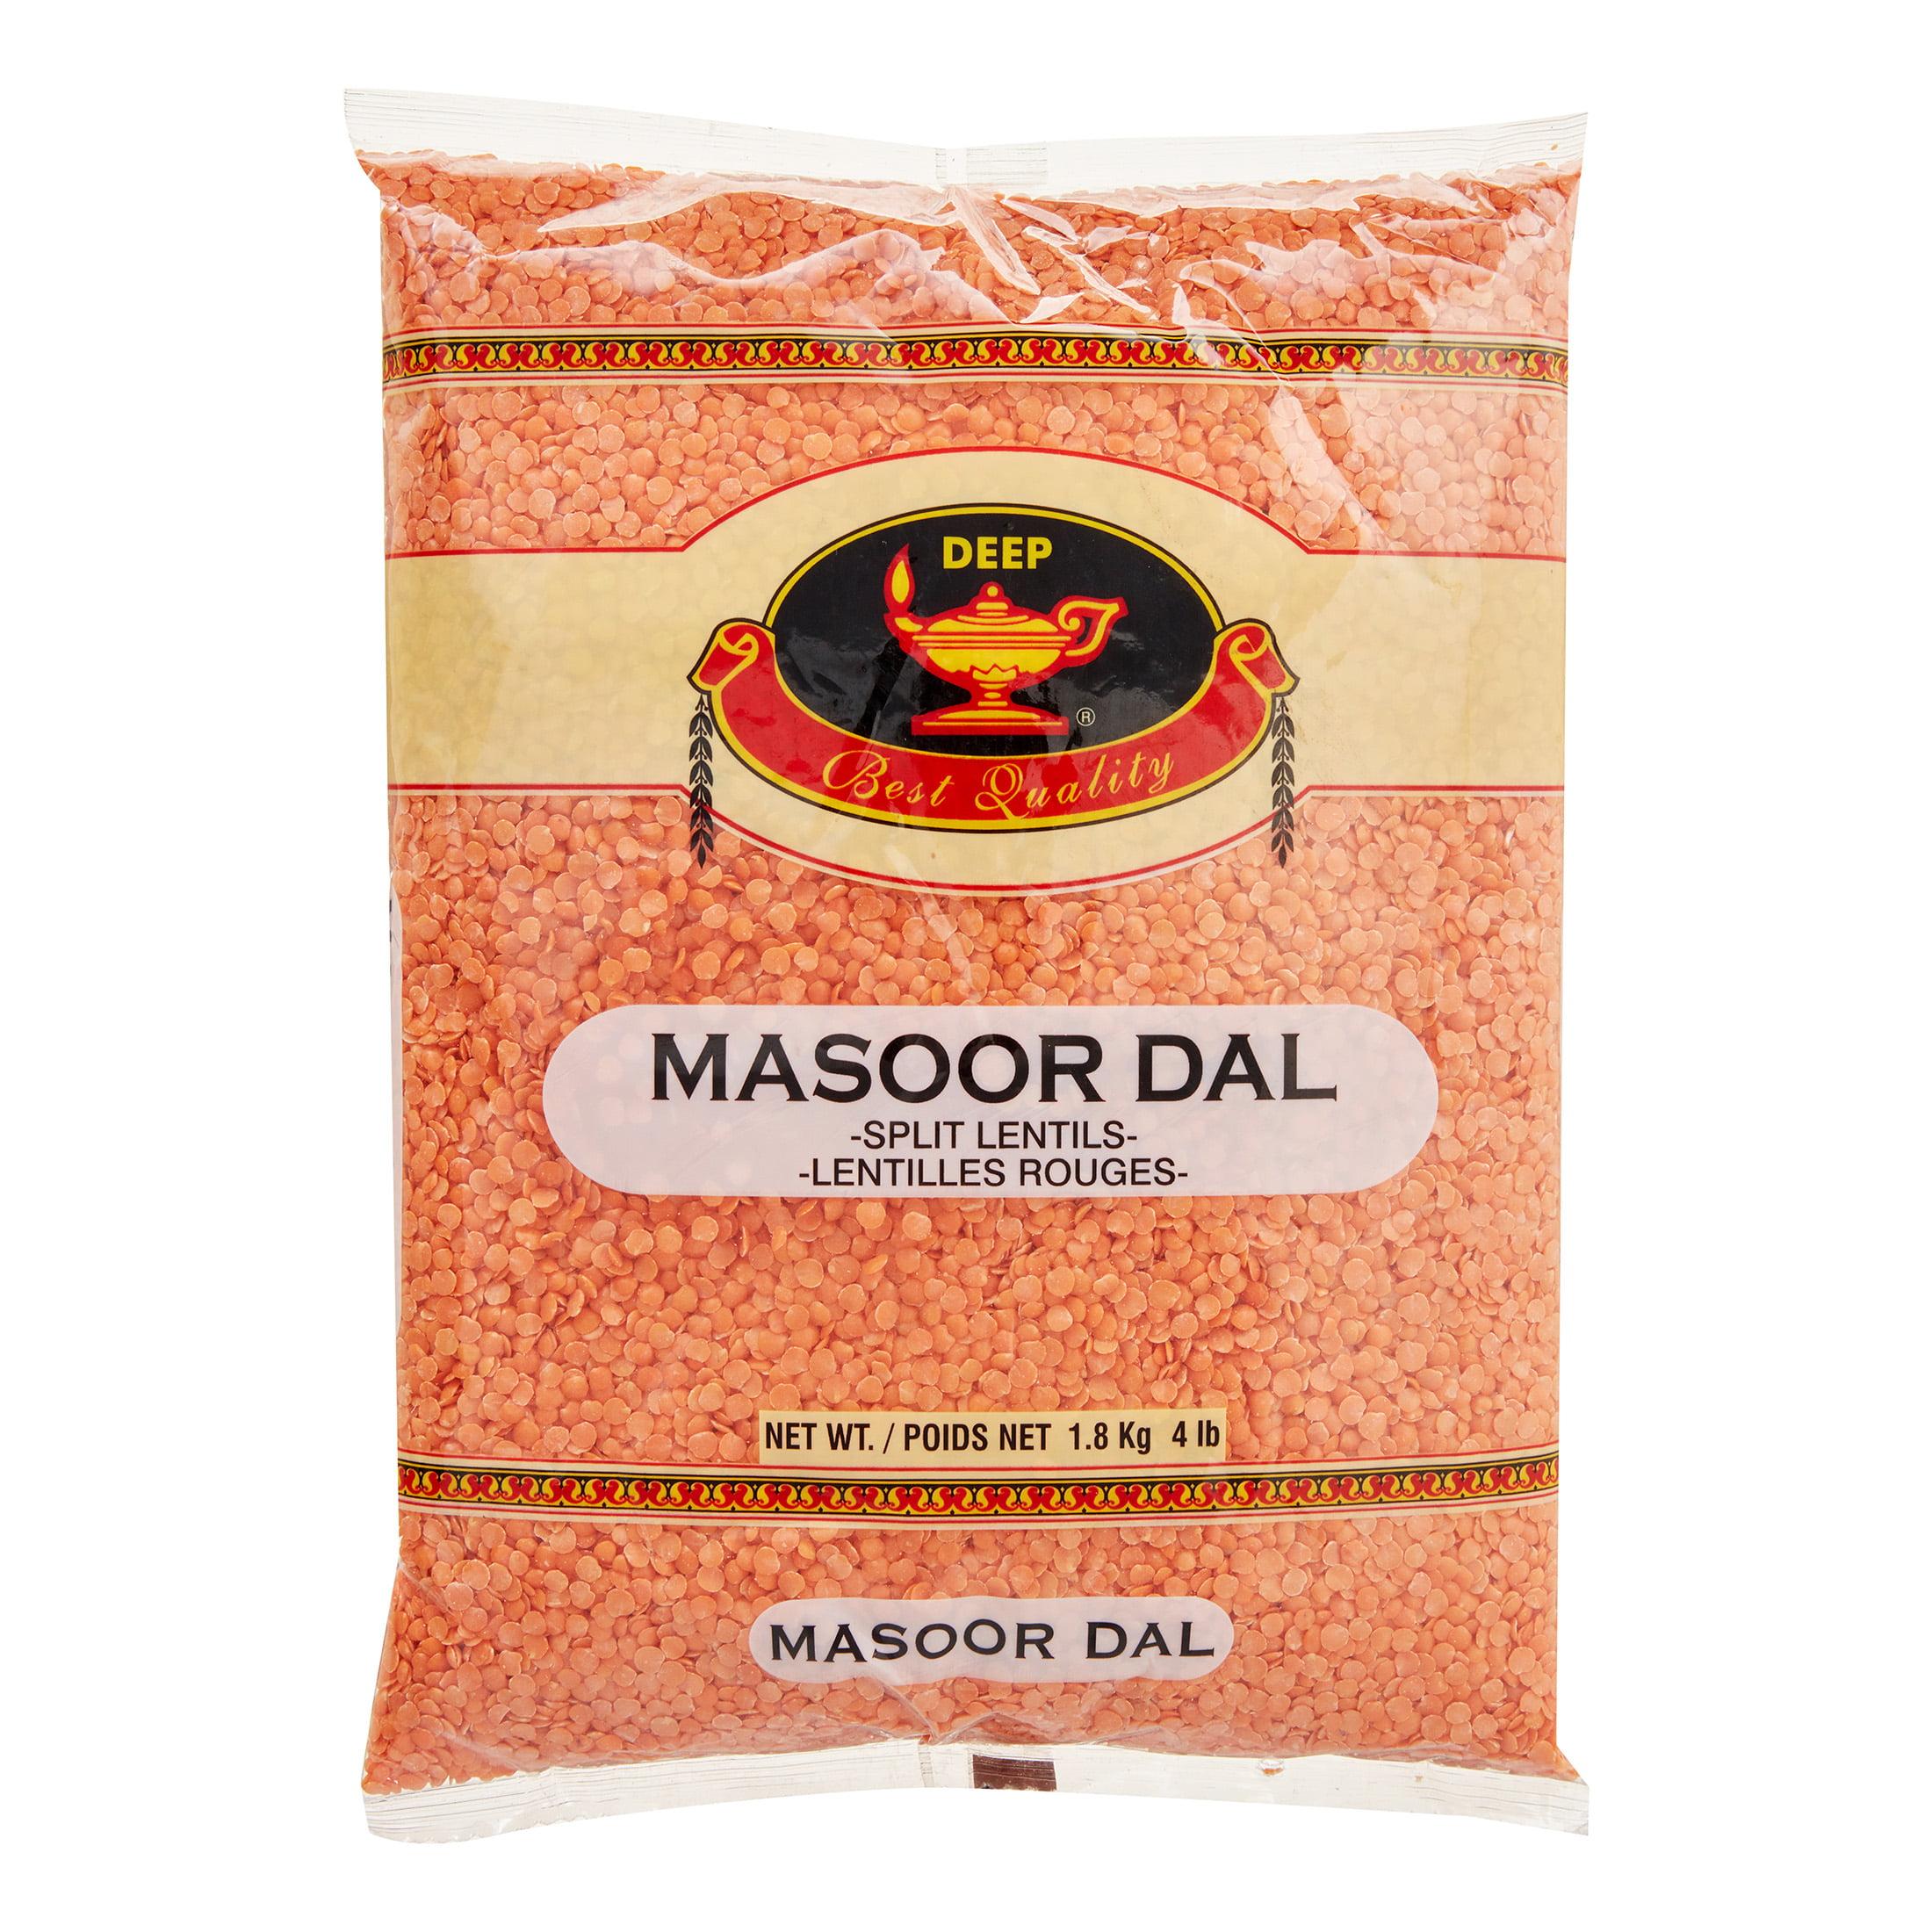 Deep Masoor Dal, 4 Lb by Chetak New York LLC